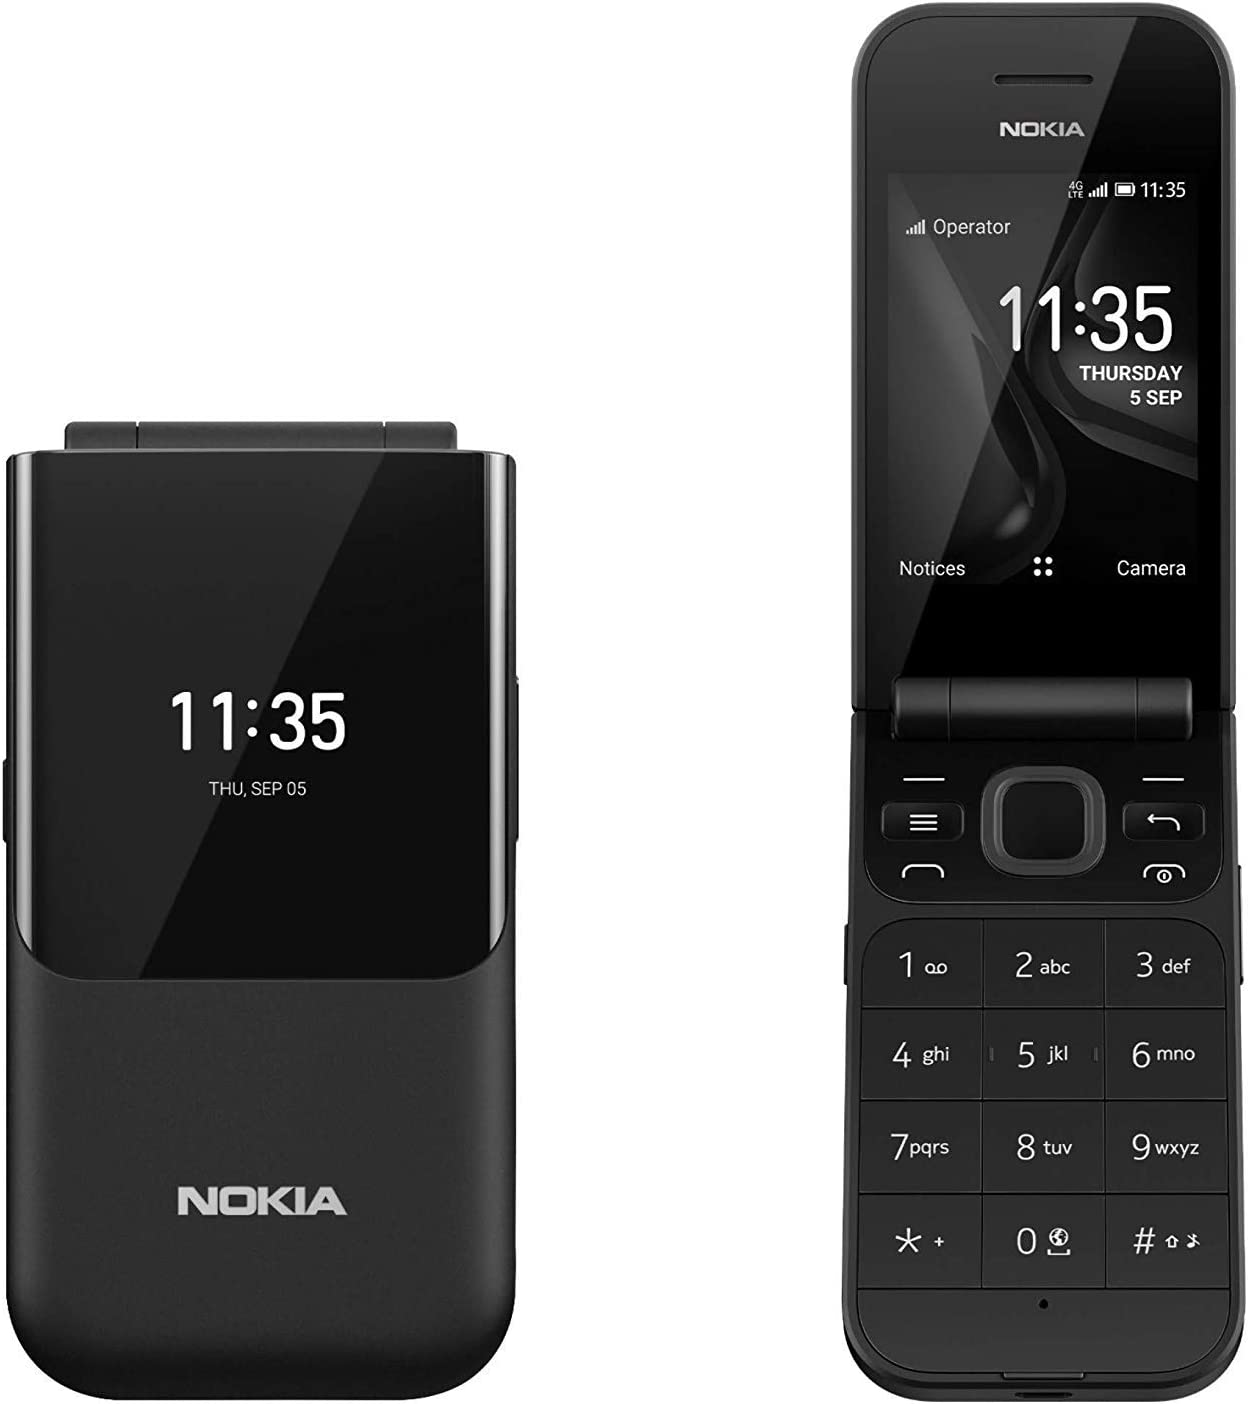 Nokia 2720 Fold Teléfono Móvil (Bluetooth, cámara de 1,3 Mpx ...